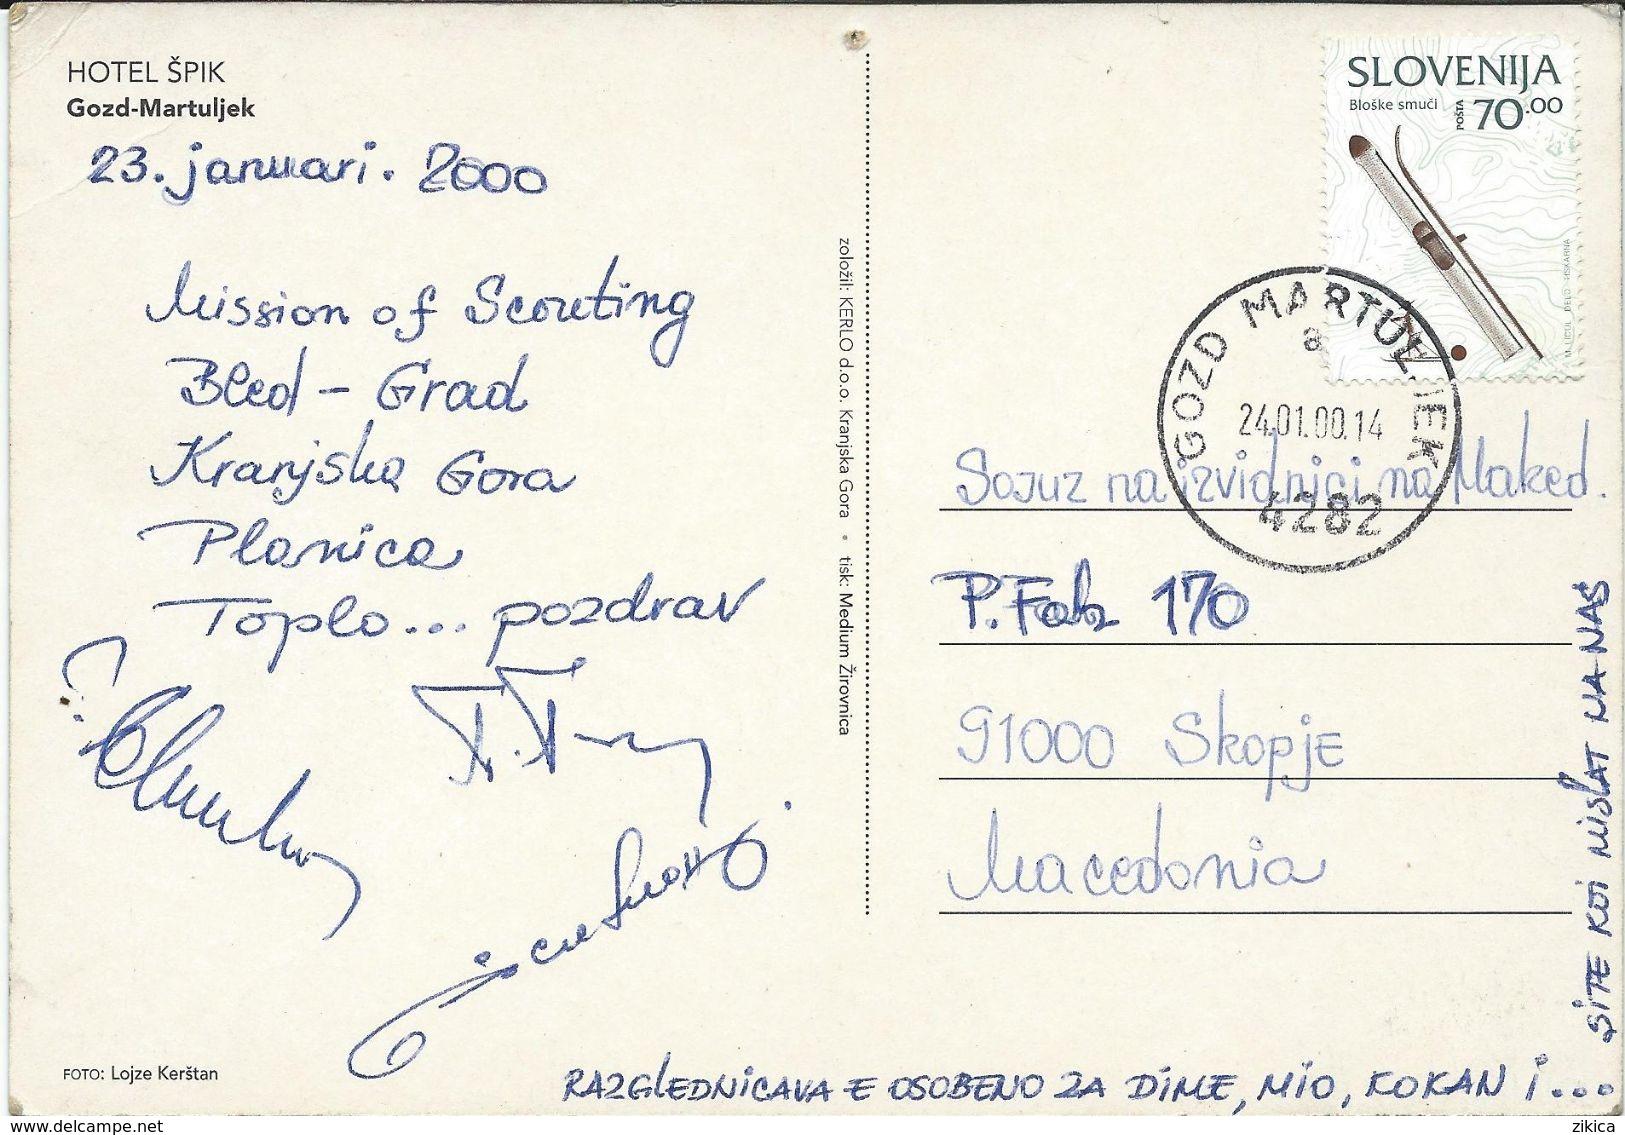 Mission Of Scouting Bled-Grad,Kranjska Gora,Planica. Slovenia. Postcard Hotel Shpik - Gozd - Martuljek - Scoutisme